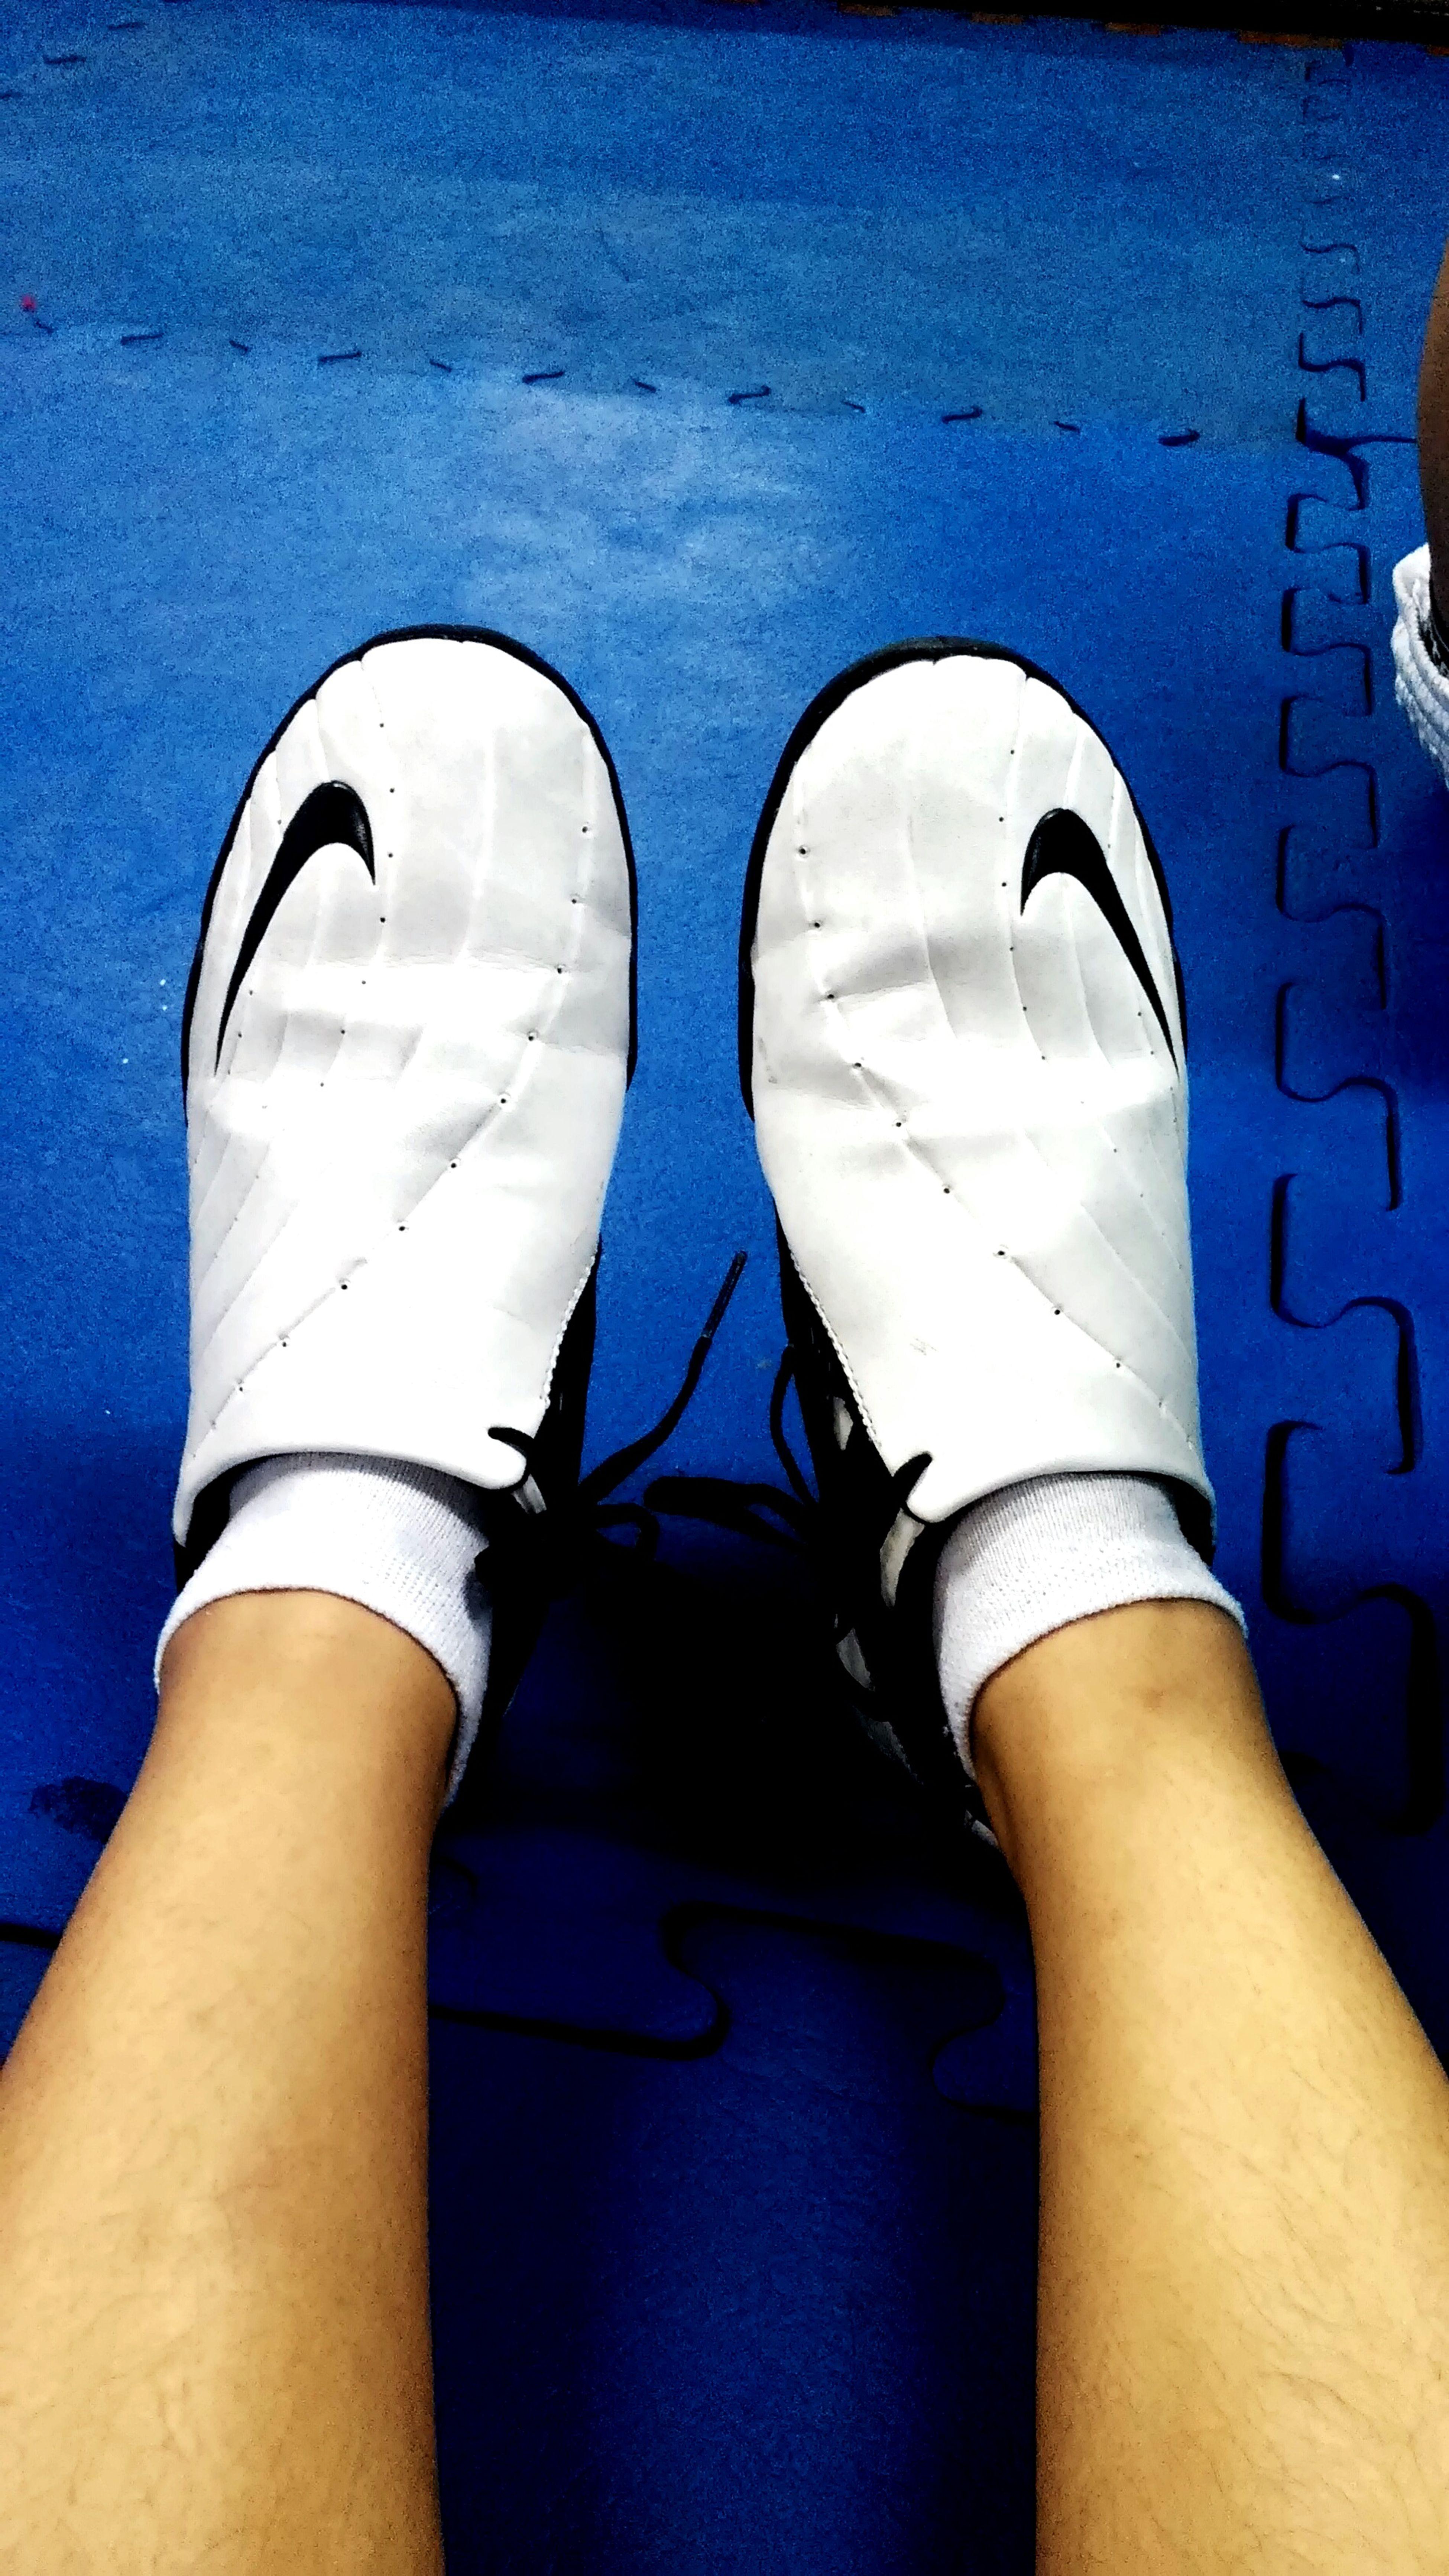 Taekwondo Filipina Nike✔ Kickshoes